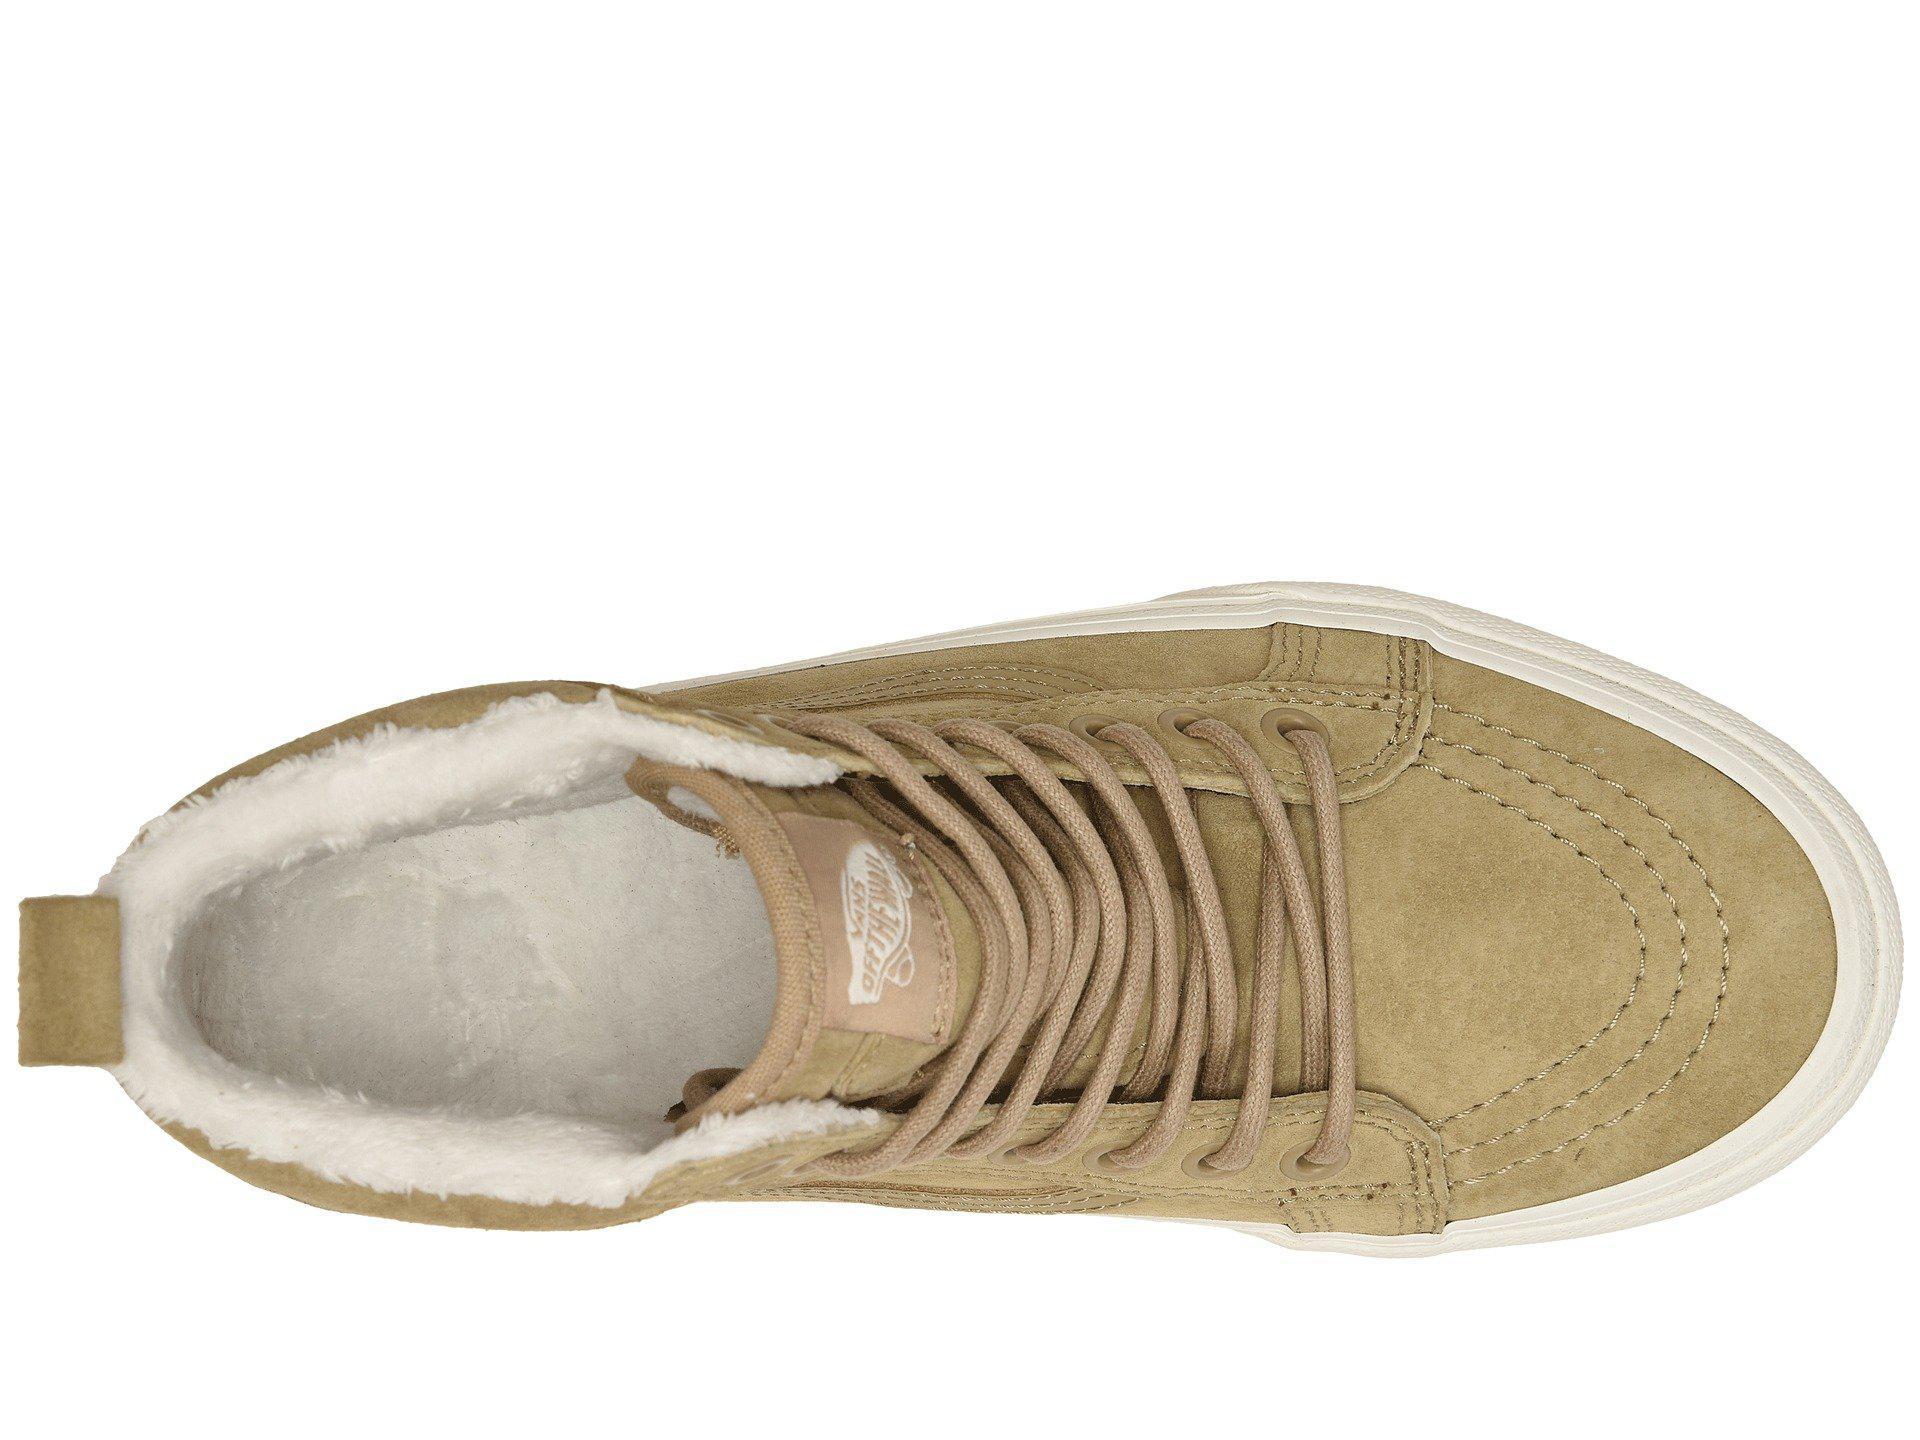 Mte For Vans Shoes Sk8 Men mte Lyst Skate Hi Suedechocolate Torte tBwRnOaOq